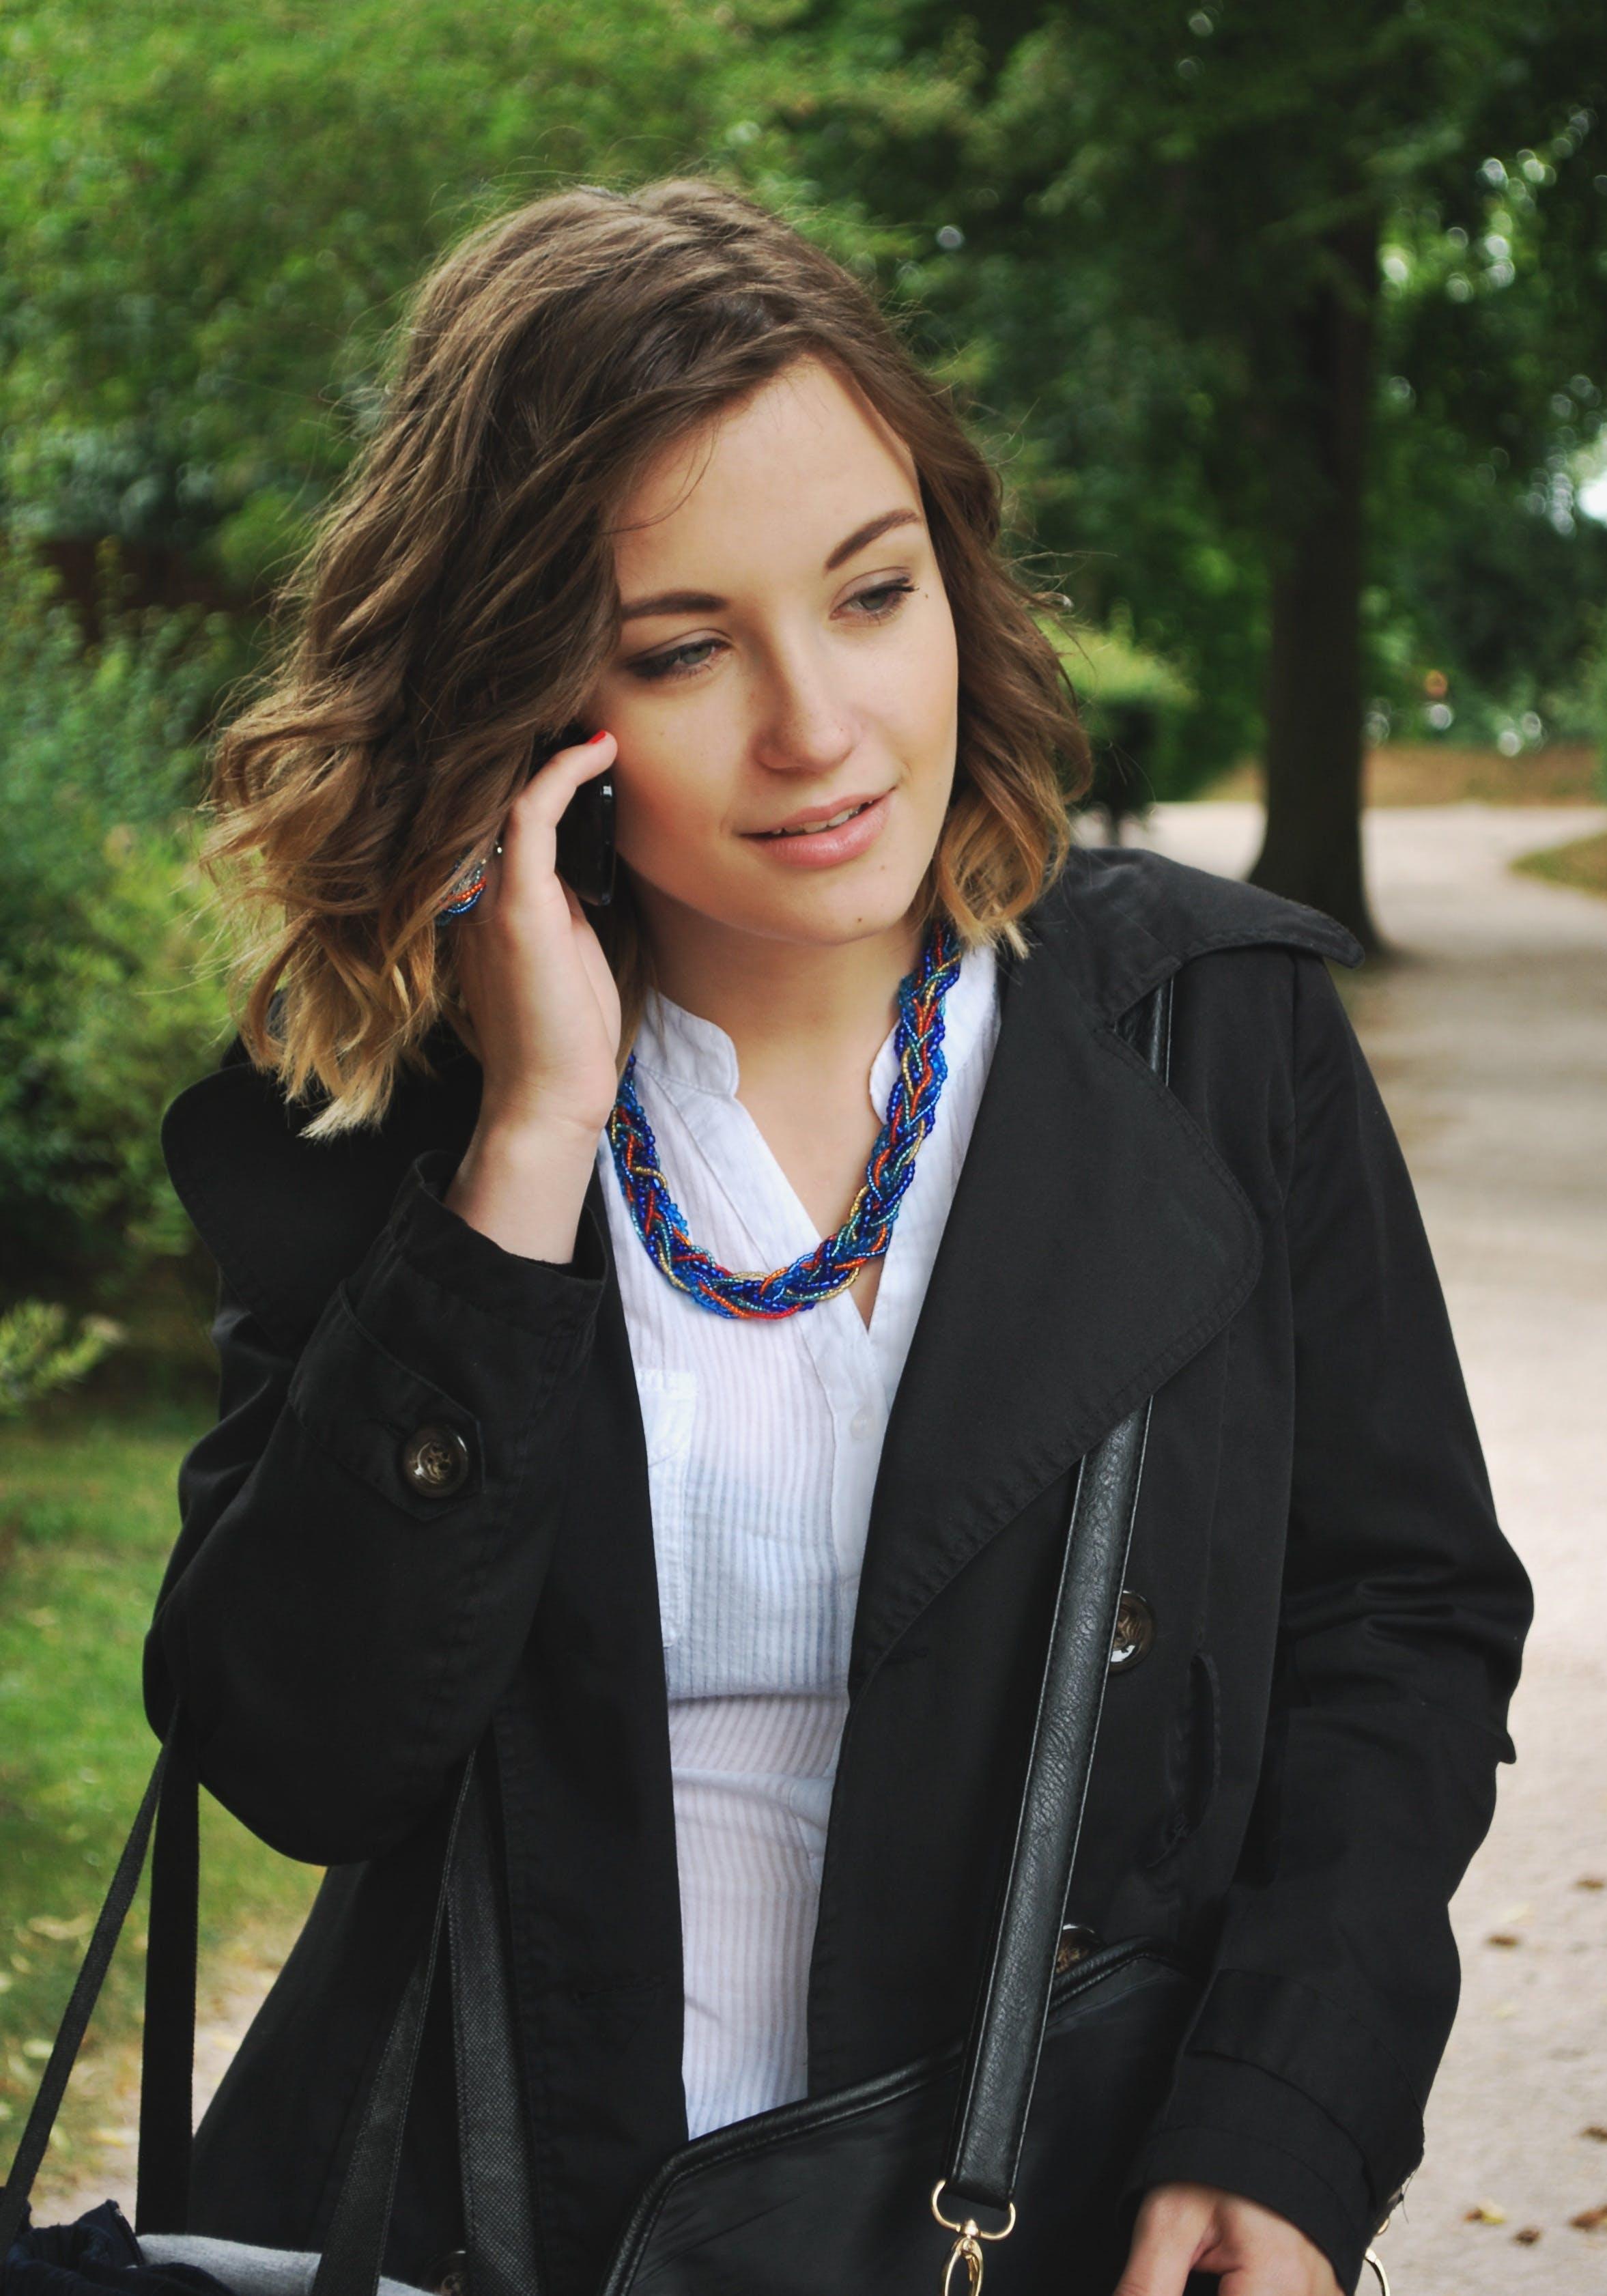 Free stock photo of woman, park, beauty, phone